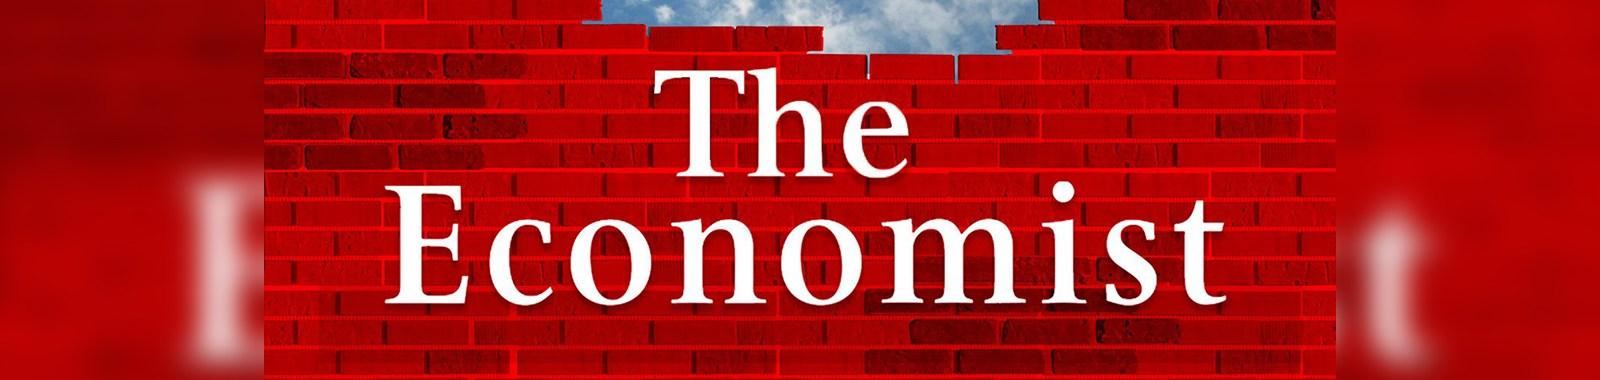 The-Economist-bricks-eye